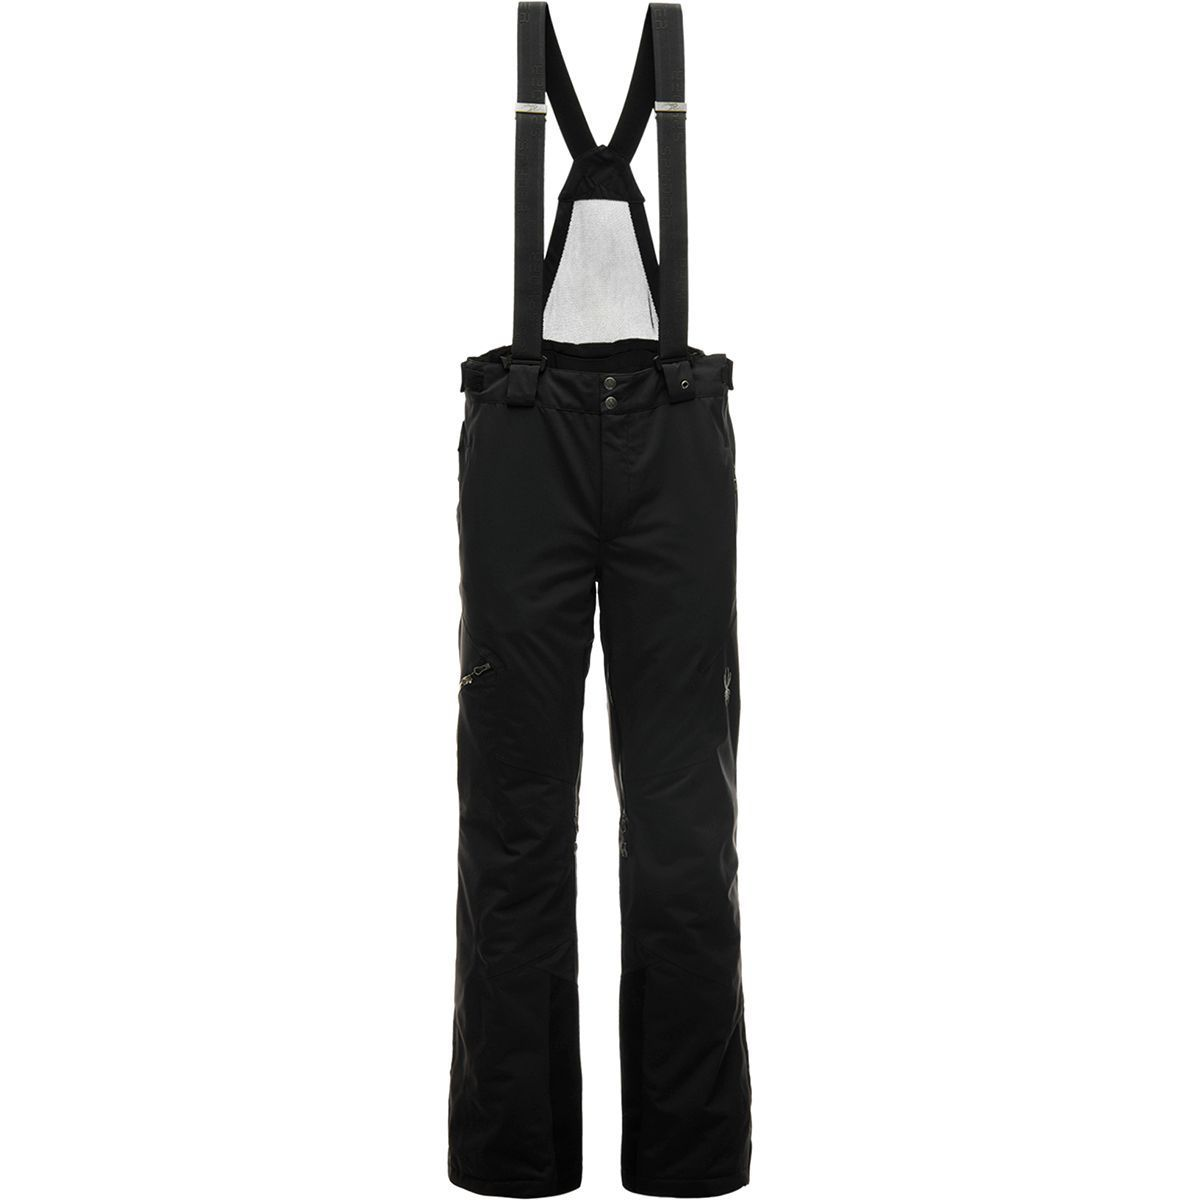 Spyder Dare Tailored Pant